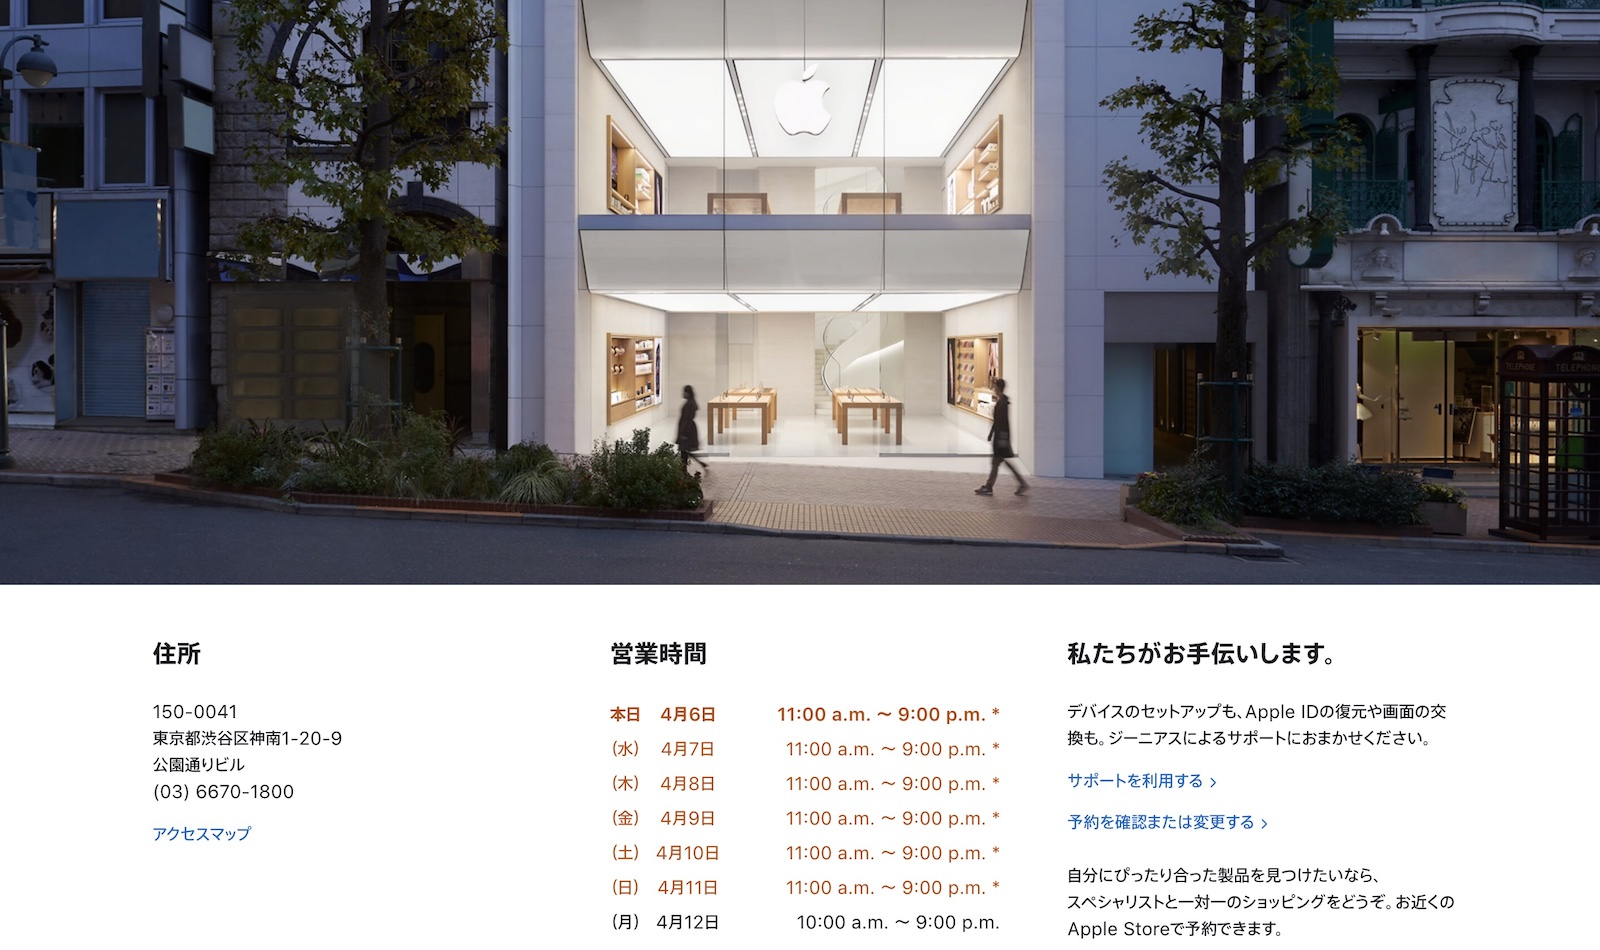 Apple Shibuya Service hours 2